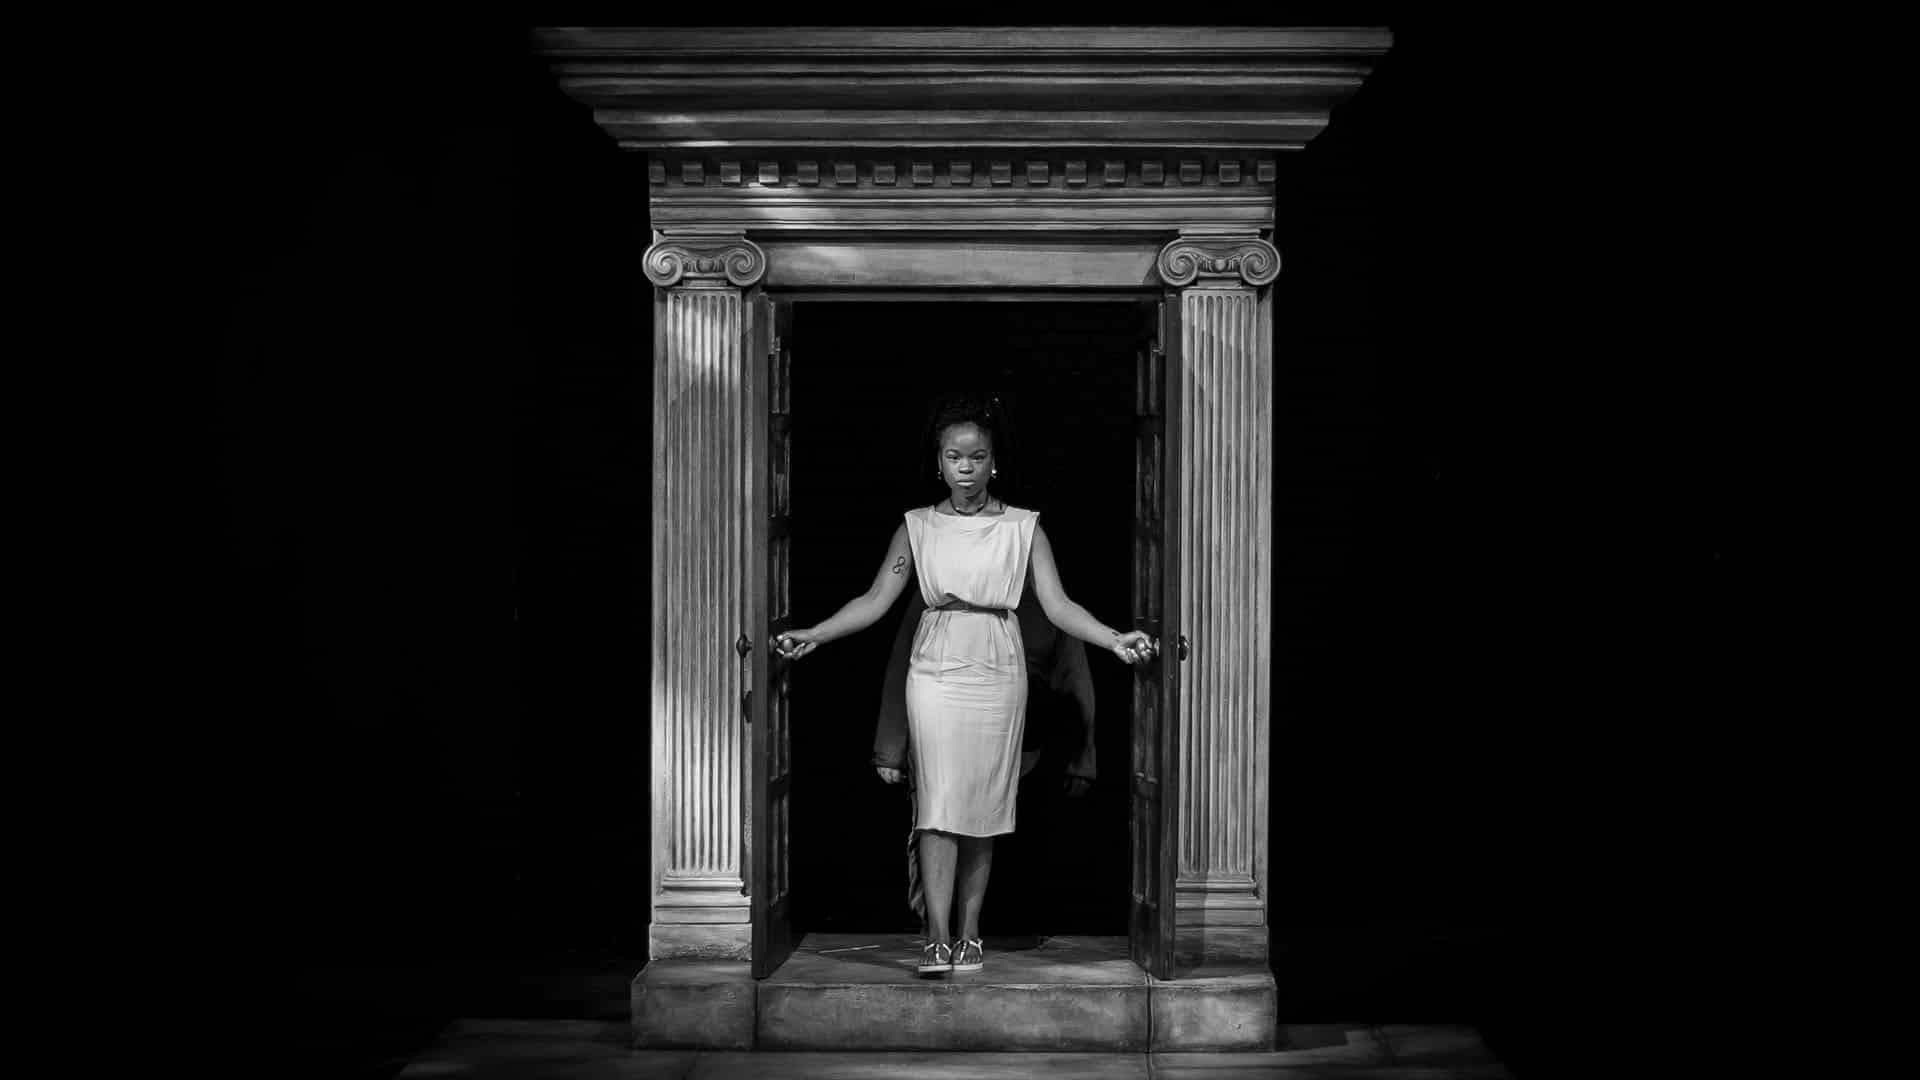 Antigone Rehearsals - Rachel Nwokoro as Antigone, defiantly walking through an ancient looking pillared doorway, wearing a tunic dress